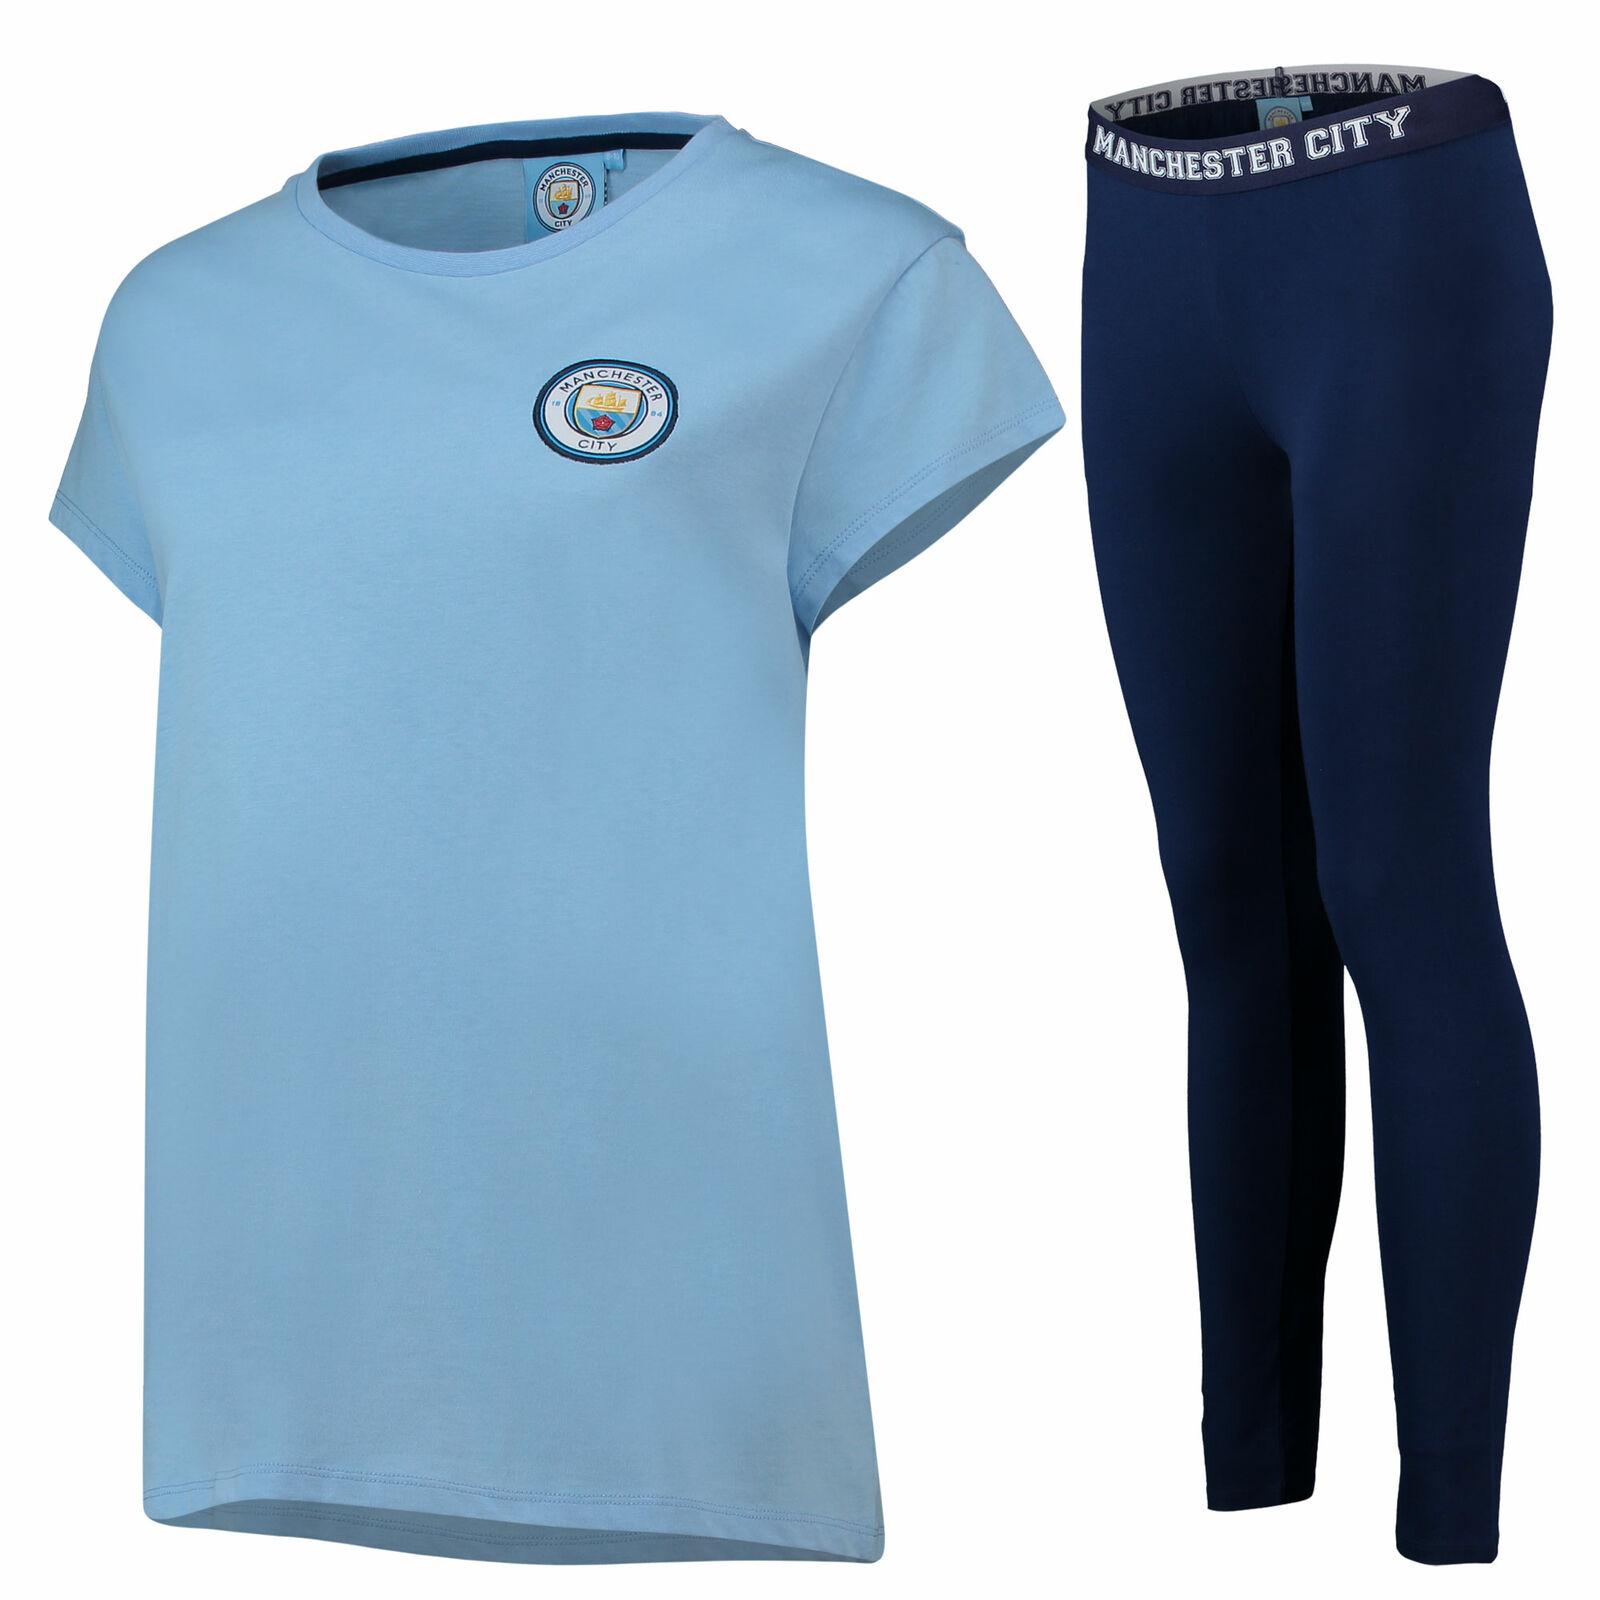 3775dd5b7bf Manchester City Oversized T And Legging Lounge Set PJ Nightwear Sky Navy  Womens